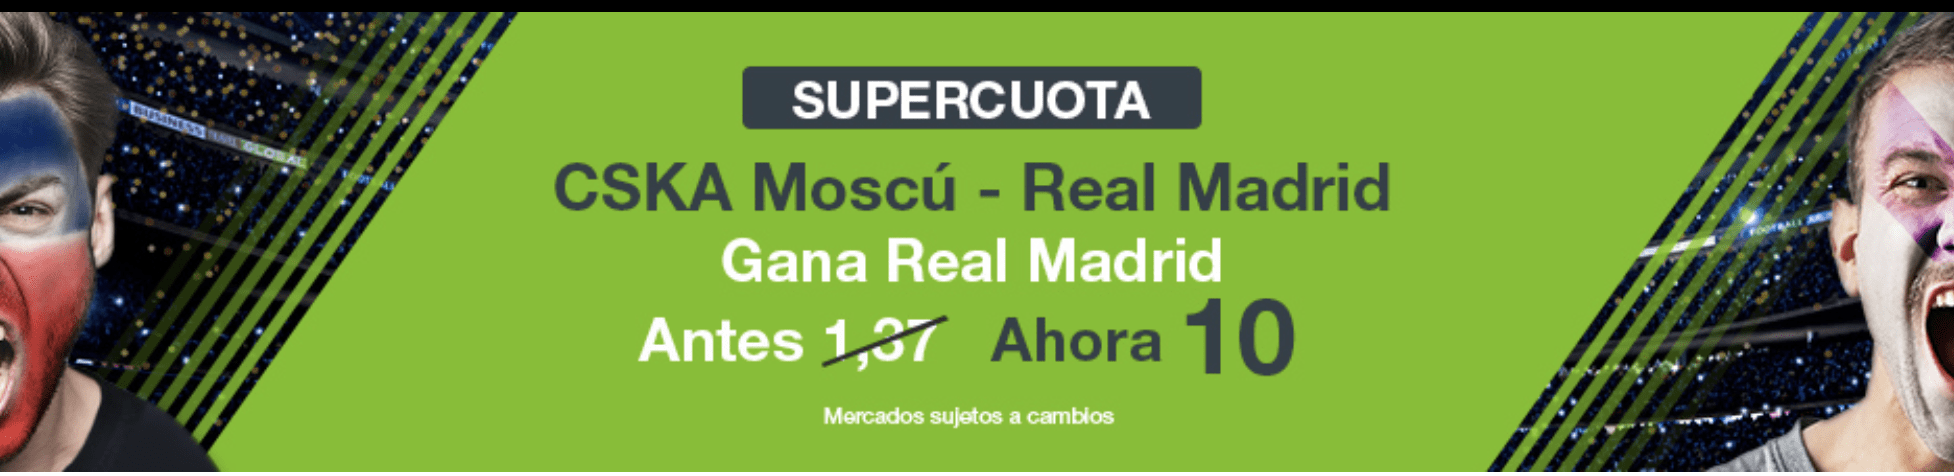 Supercuota Codere Champions League CSKA - Real Madrid